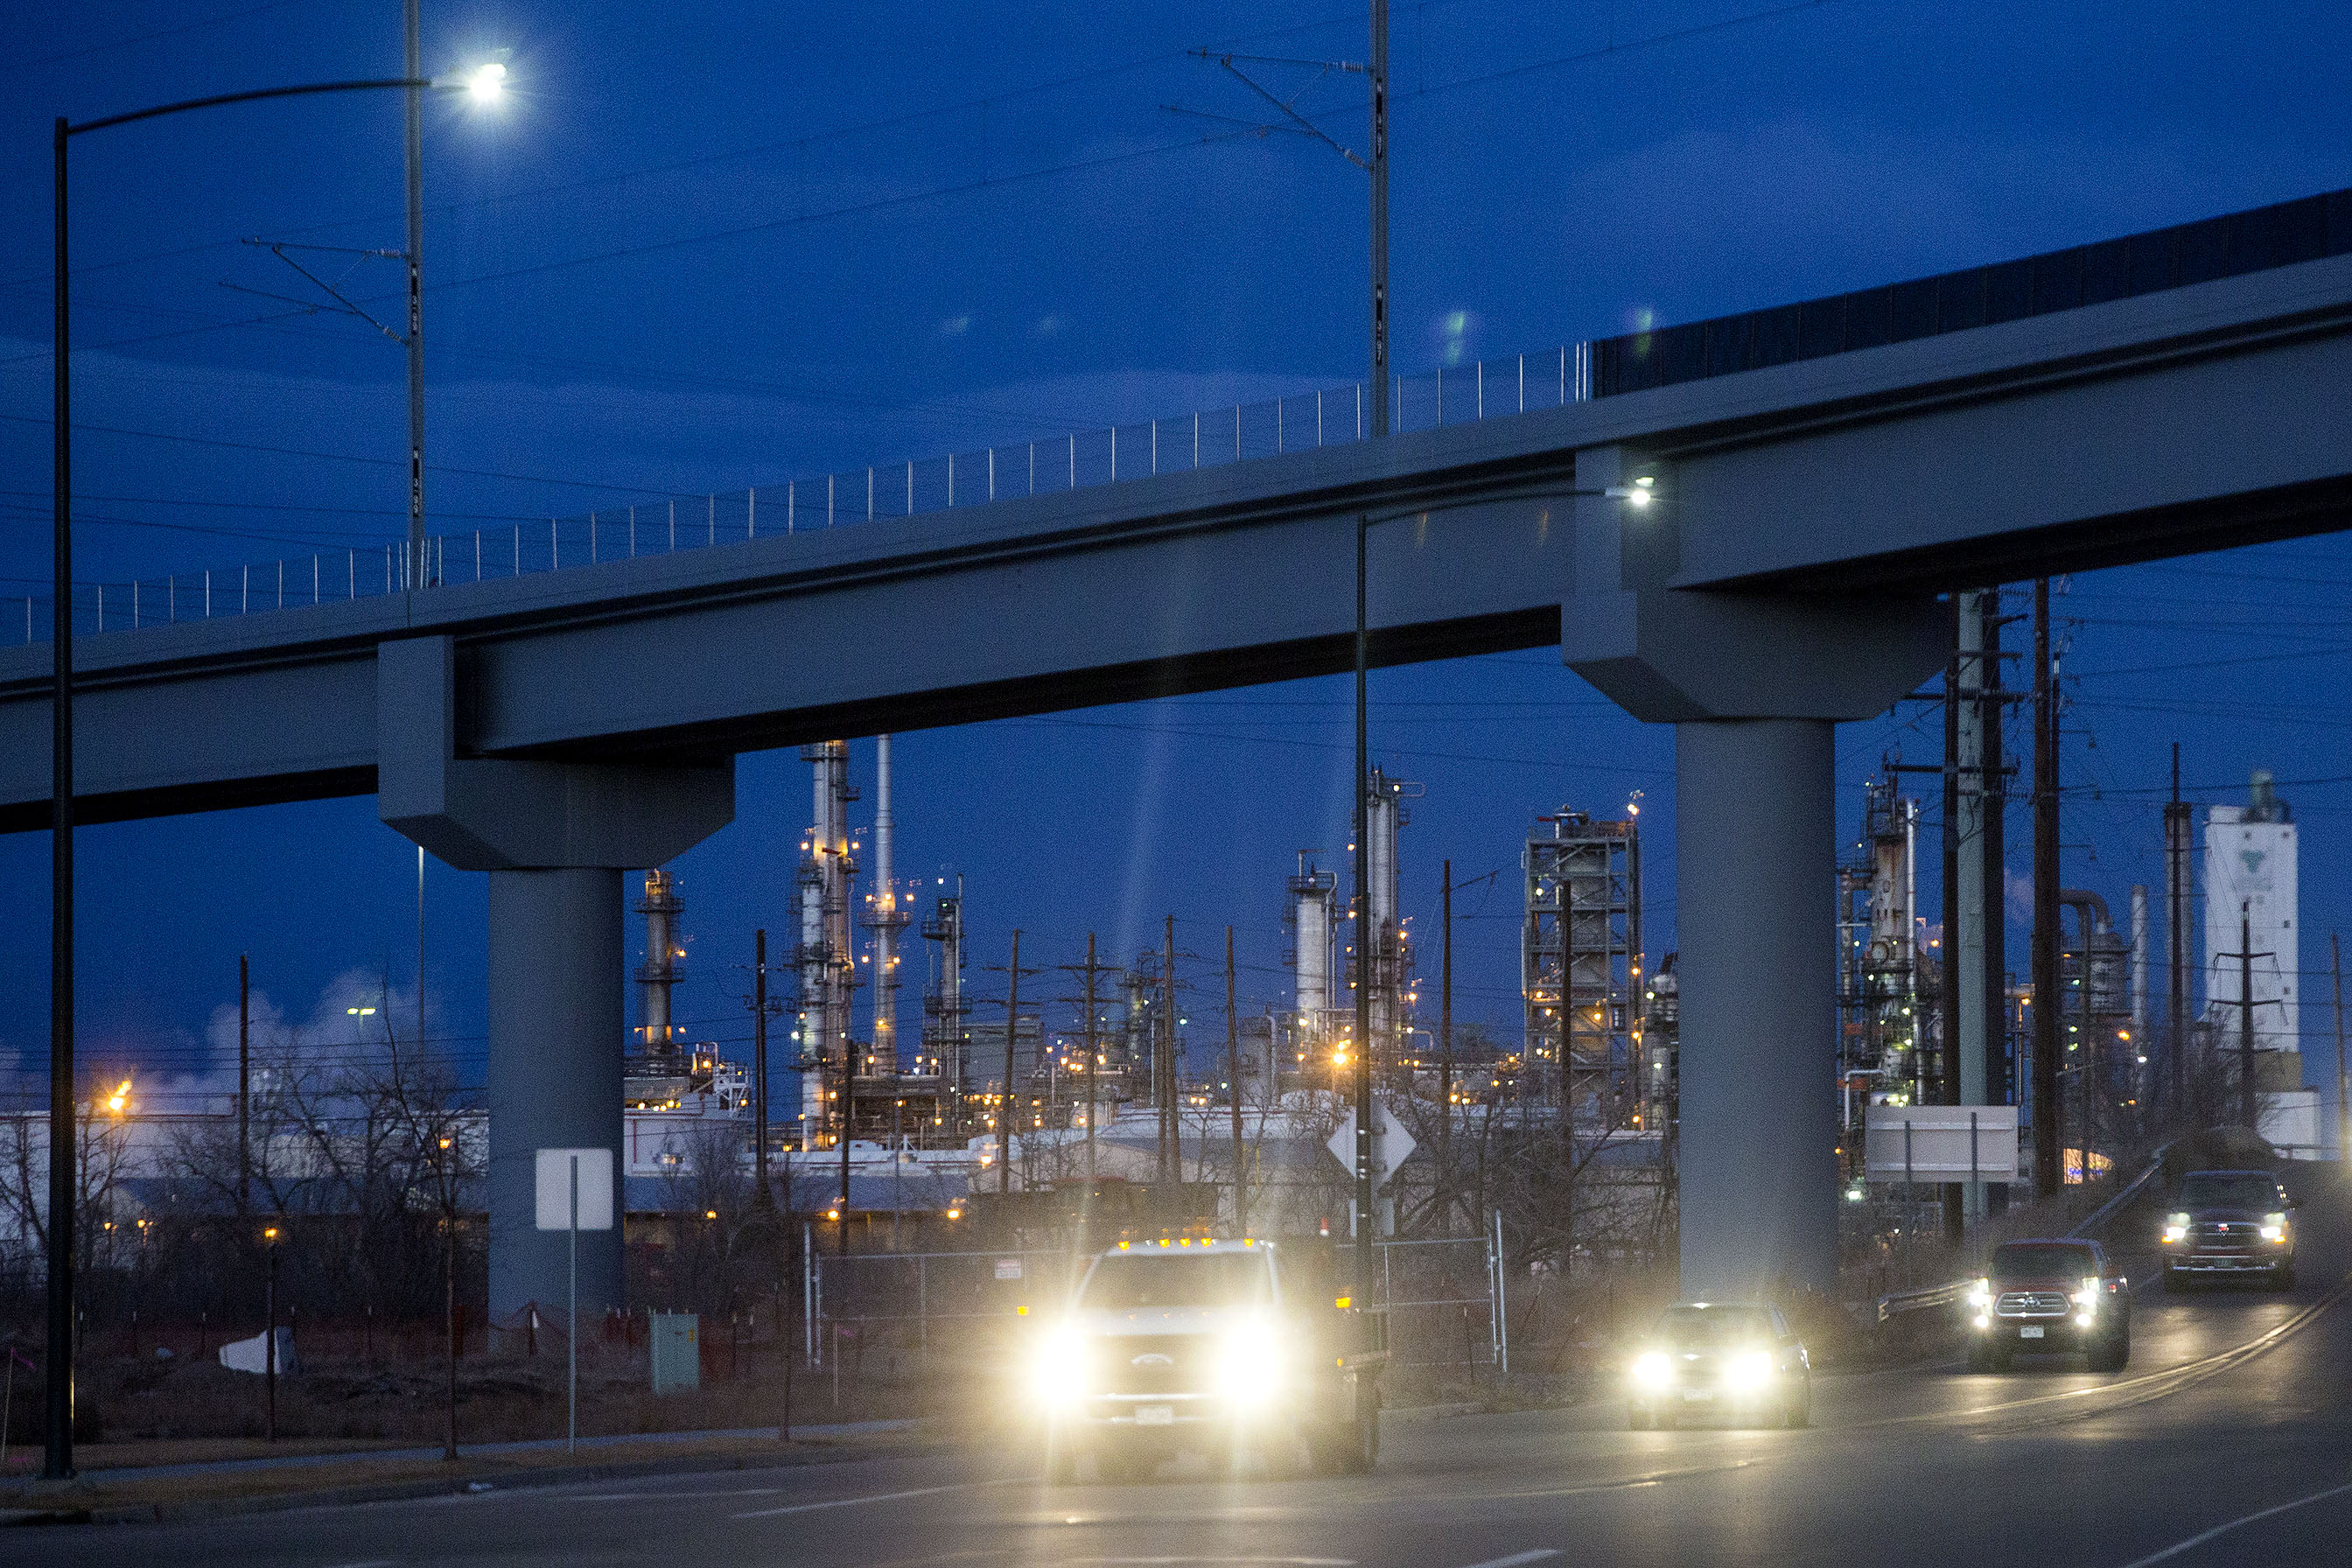 The bridge that will carry RTD's N Line commuter rail train, here over Brighton Boulevard near the Suncor Energy refinery.